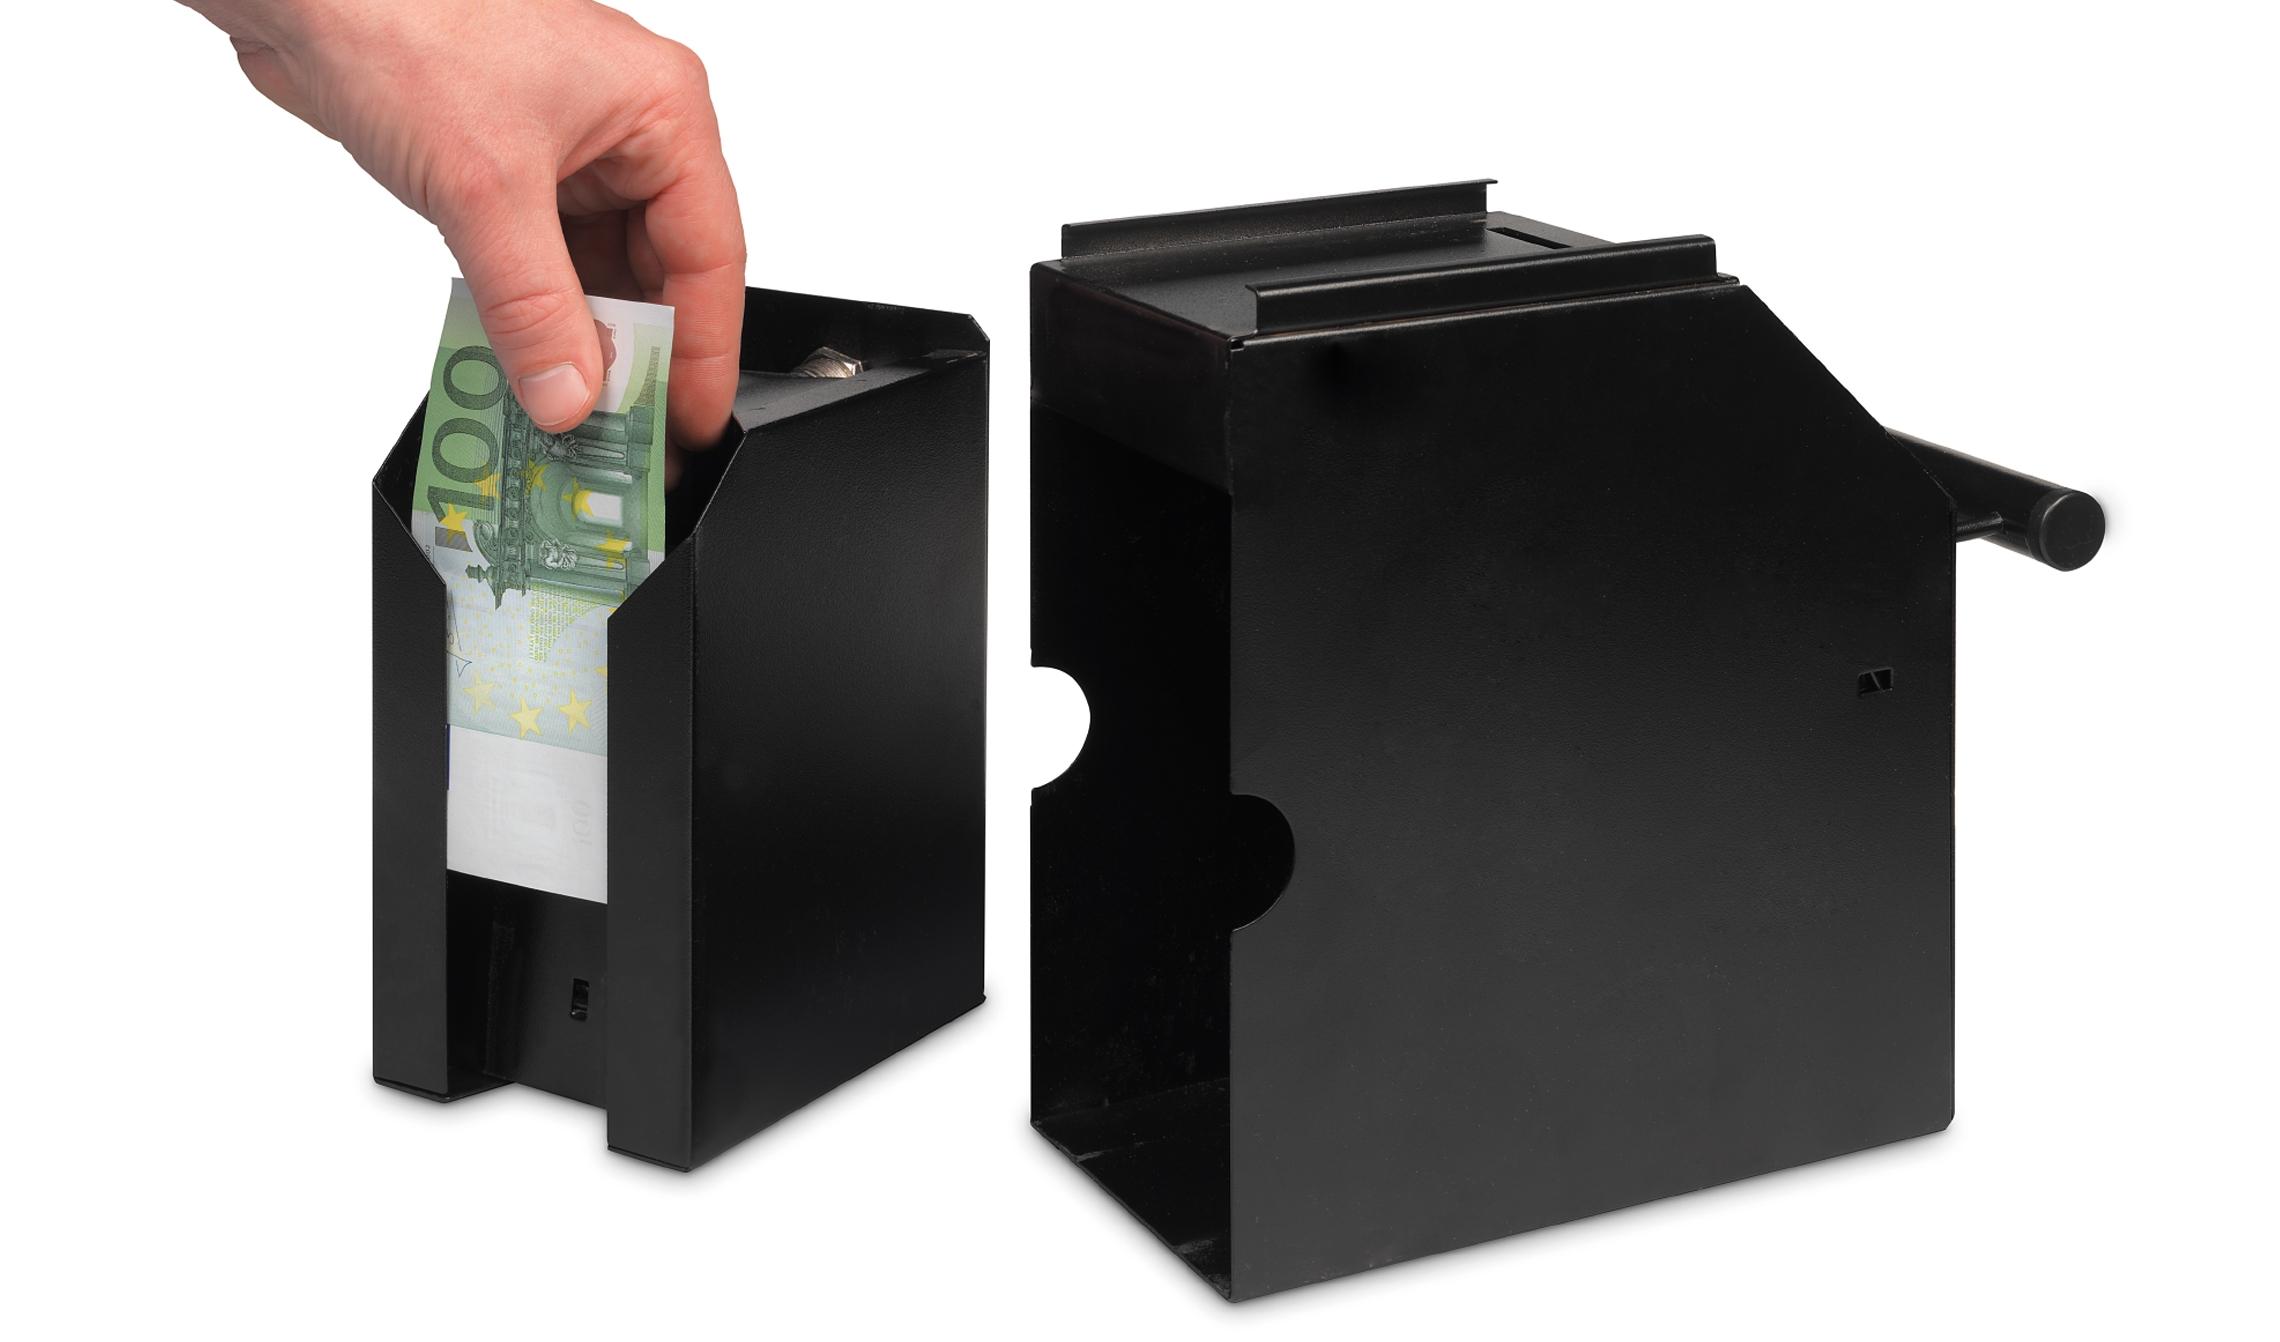 safescan-4100b-kluis-voor-bankbiljetten